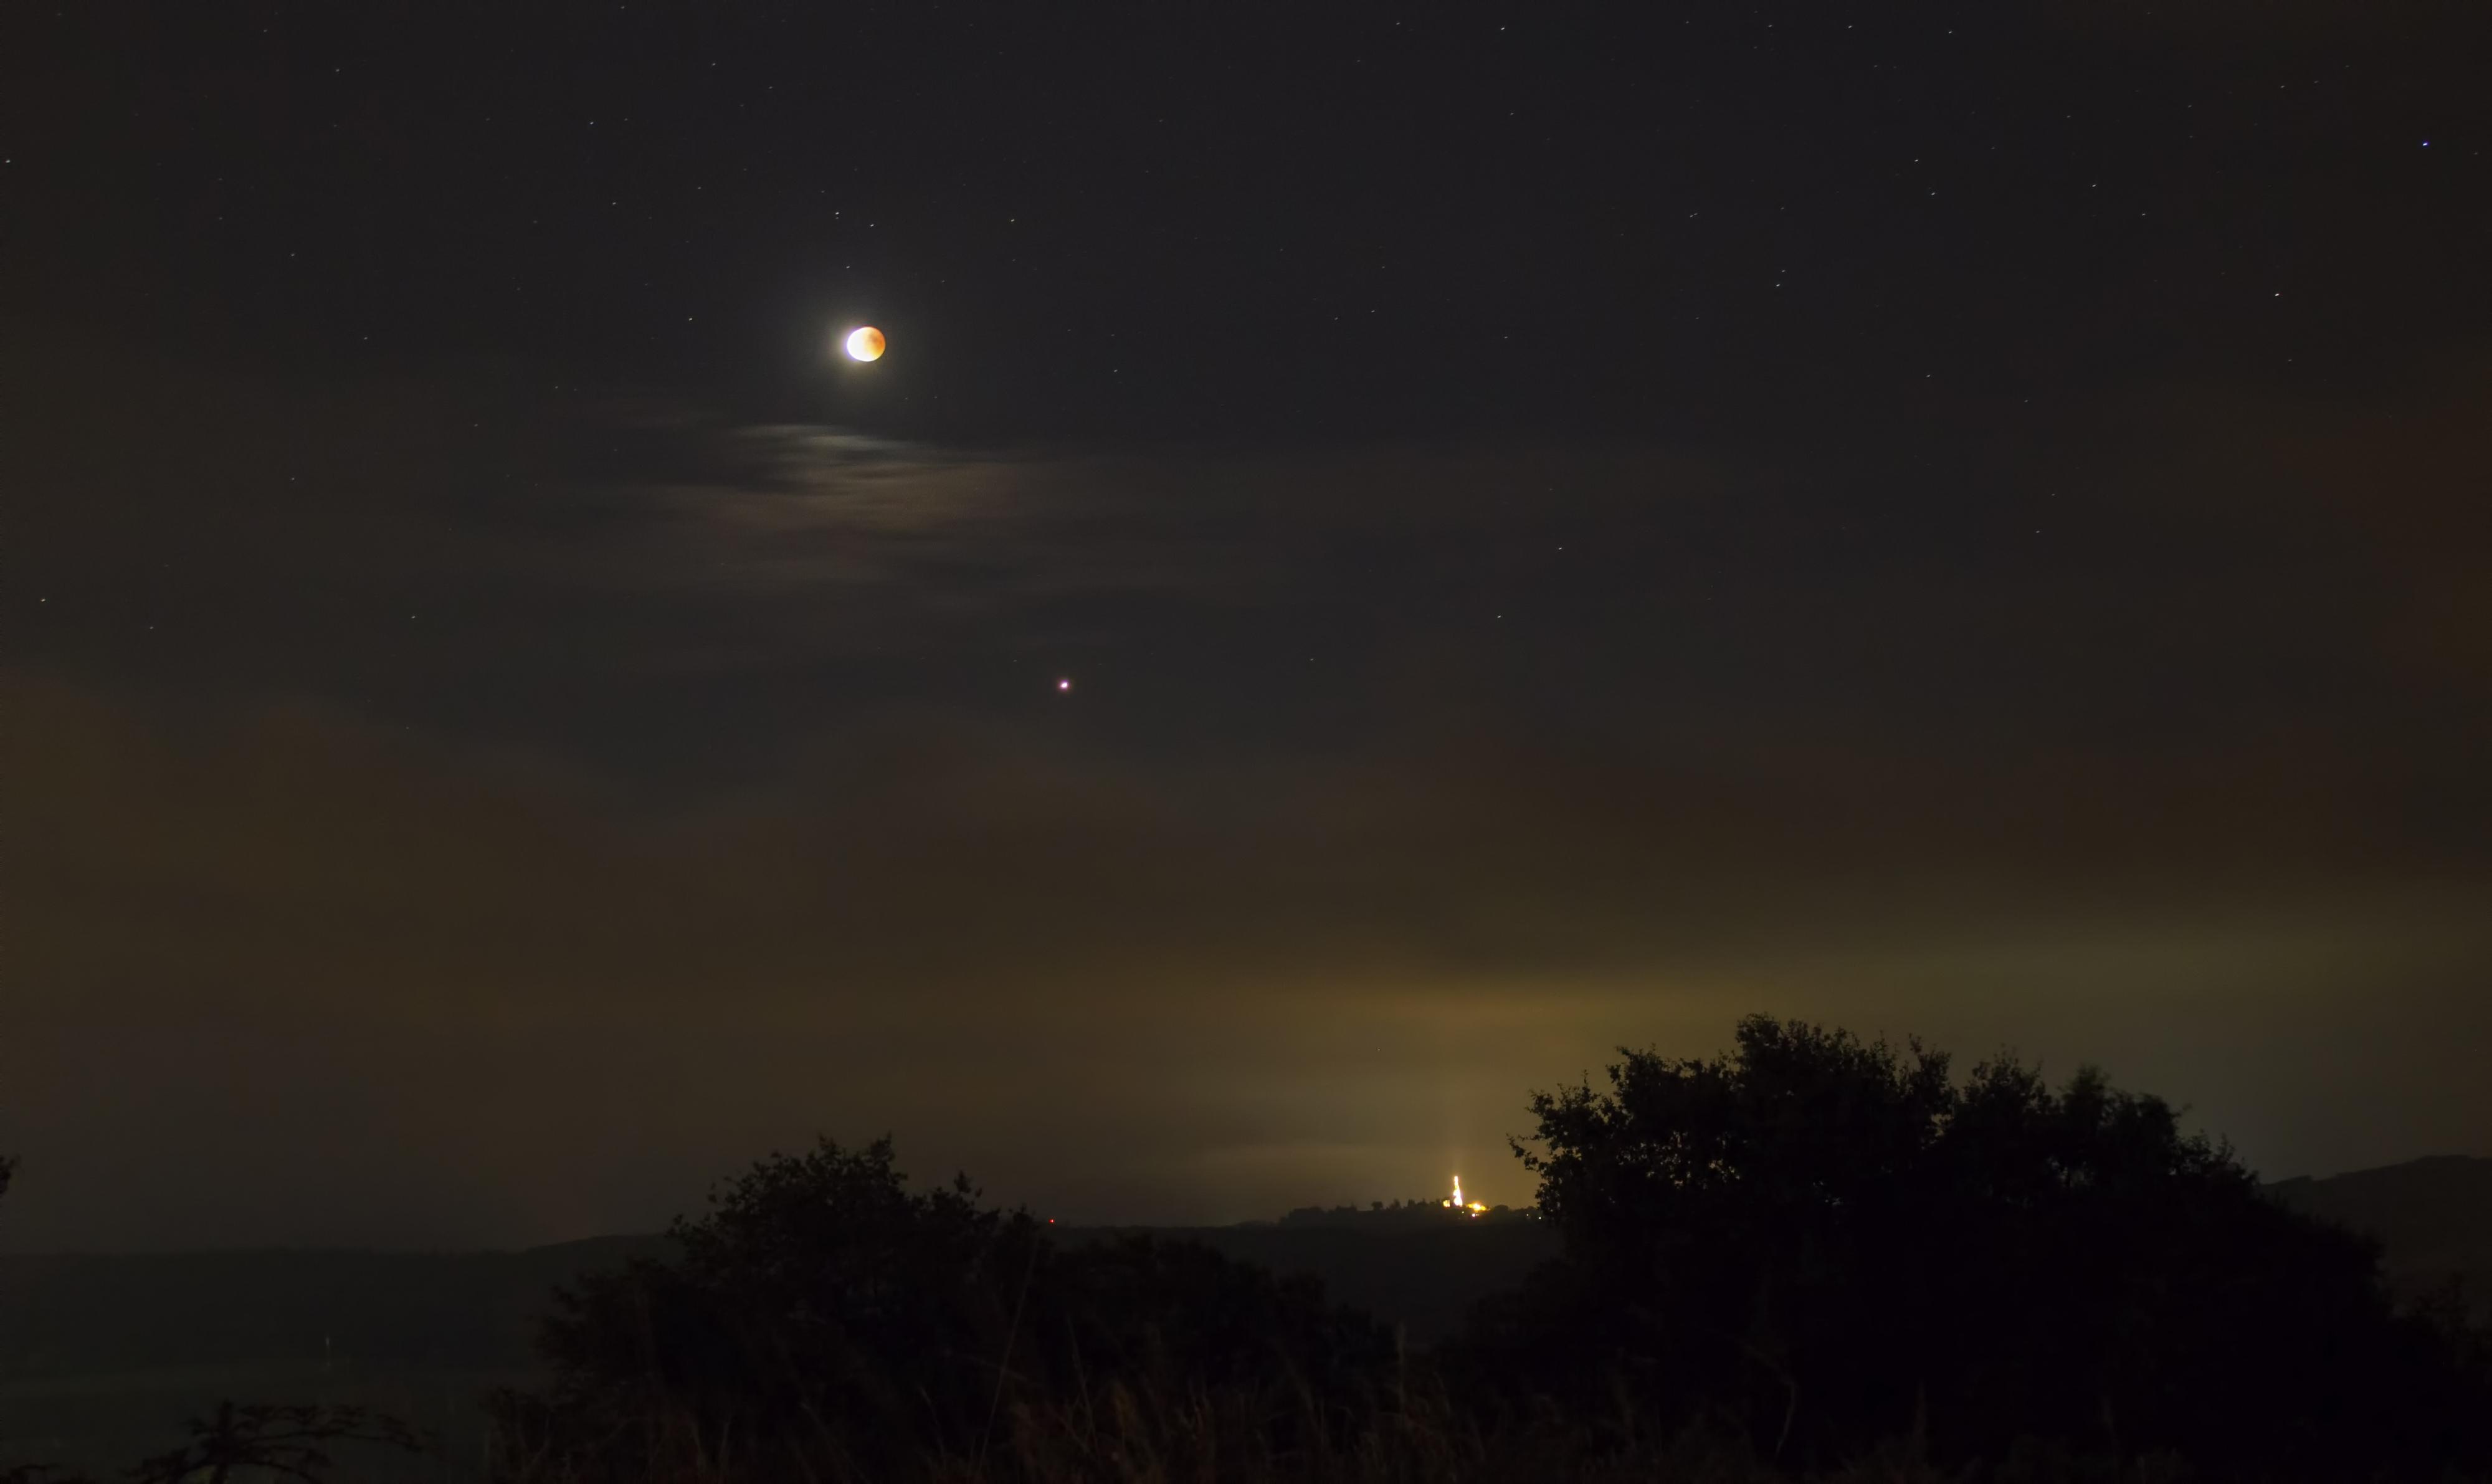 Eclipse de lune 20180727-Mars.jpg